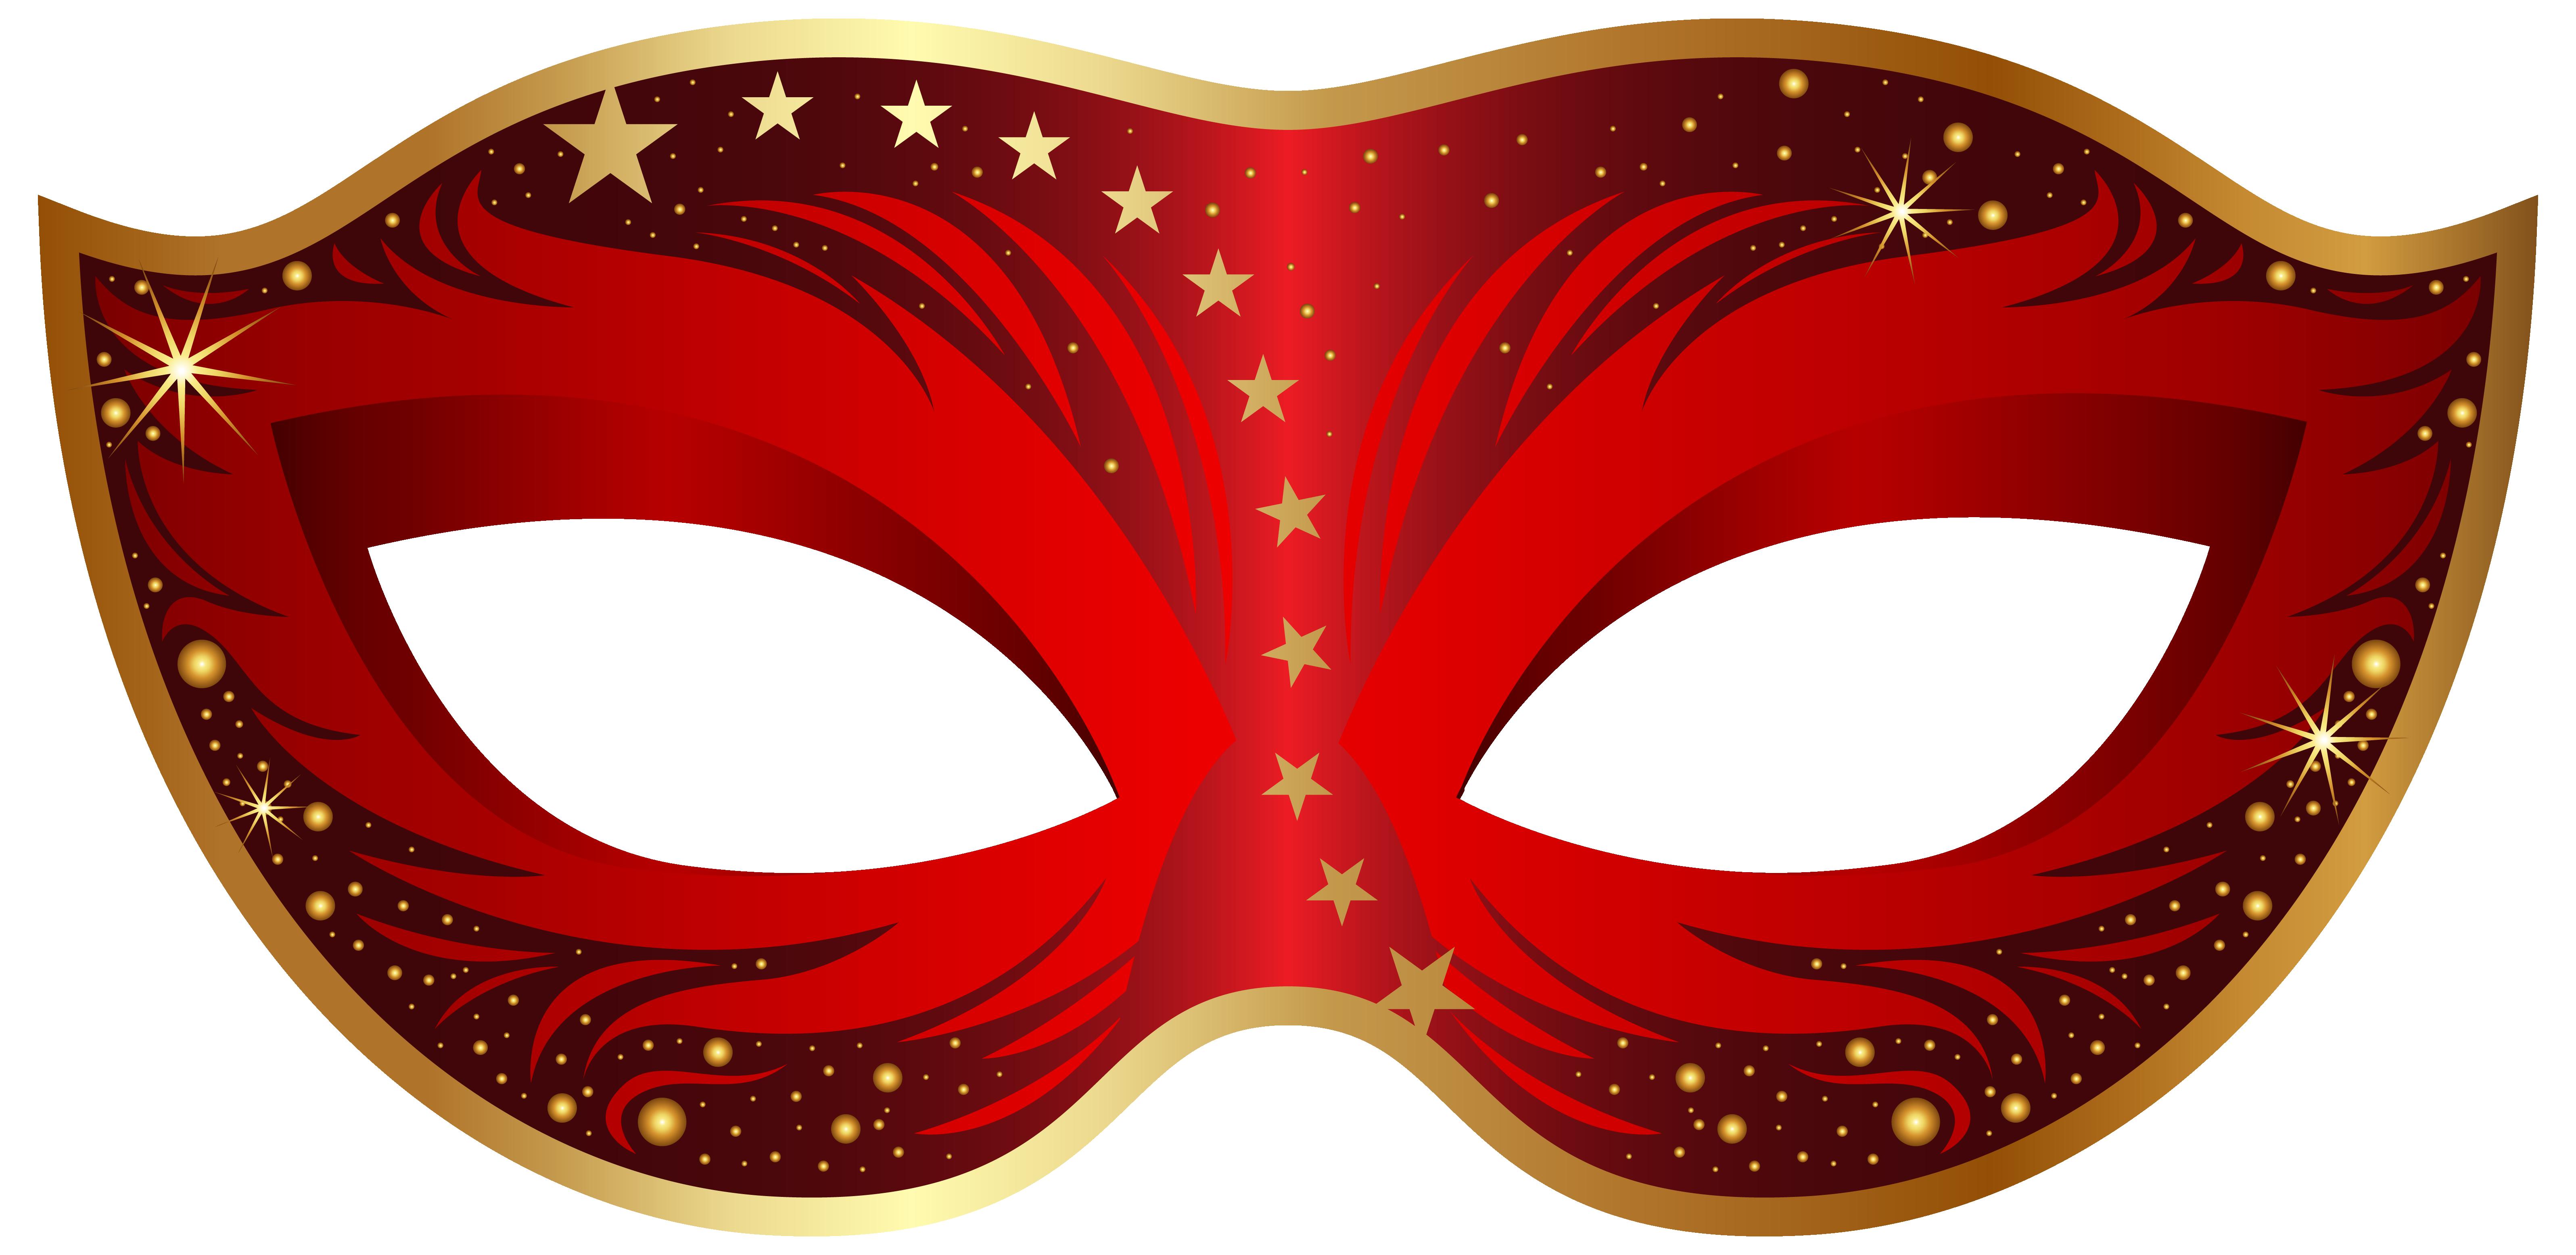 Masquerade Mask Clipart at GetDrawings.com.